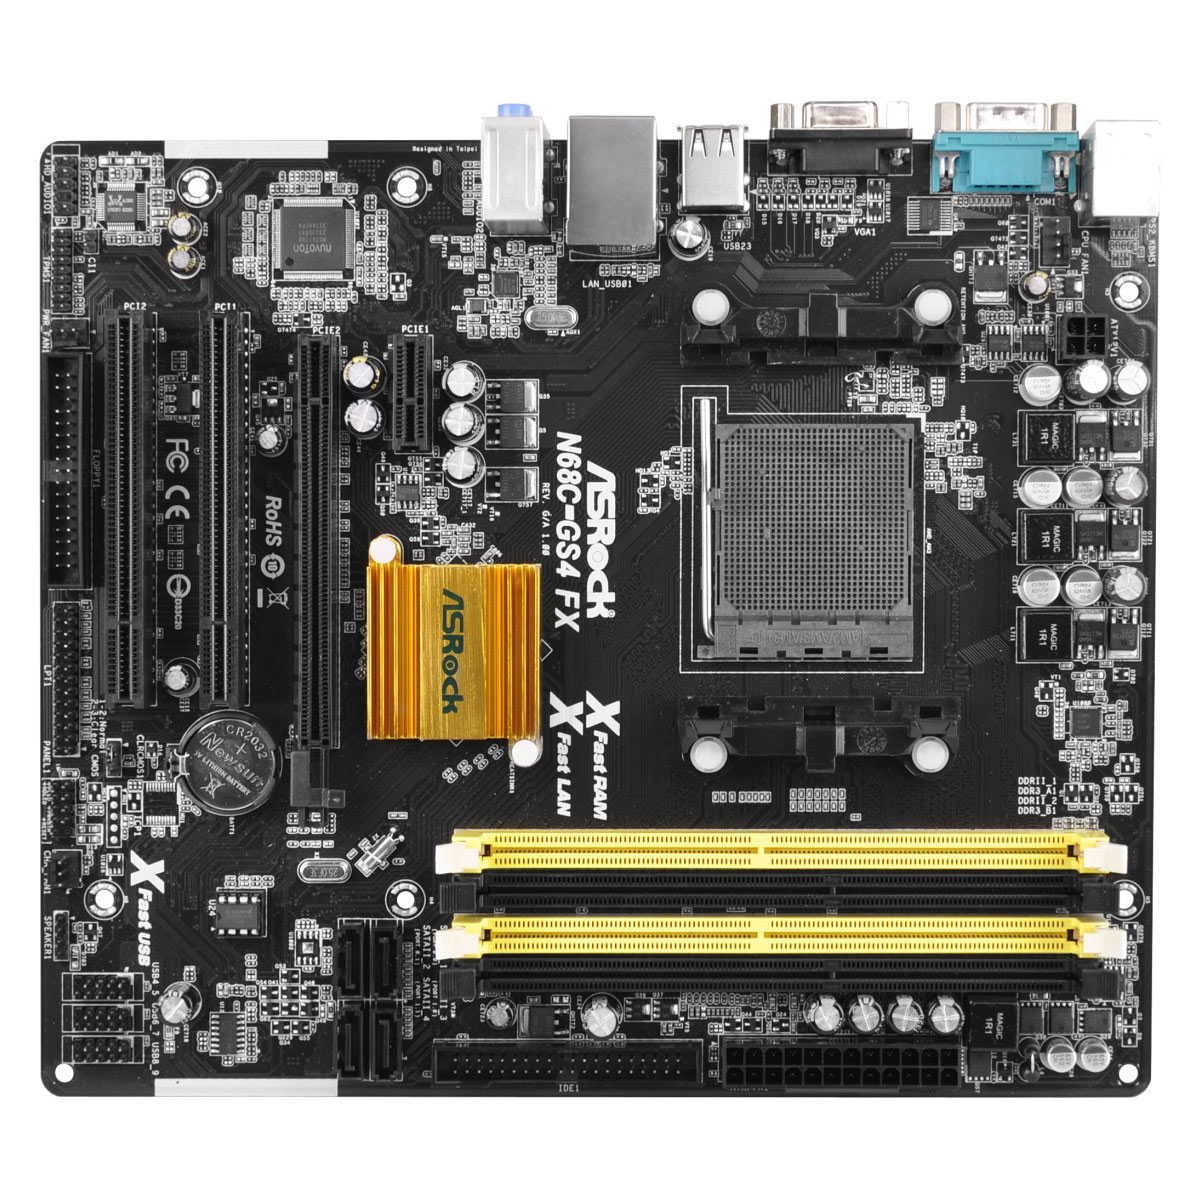 Asrock N68c Gs4 Fx Am3 Motherboard End 1 27 2018 1215 Pm Mainboard Buildup Lga 775 Ddr3